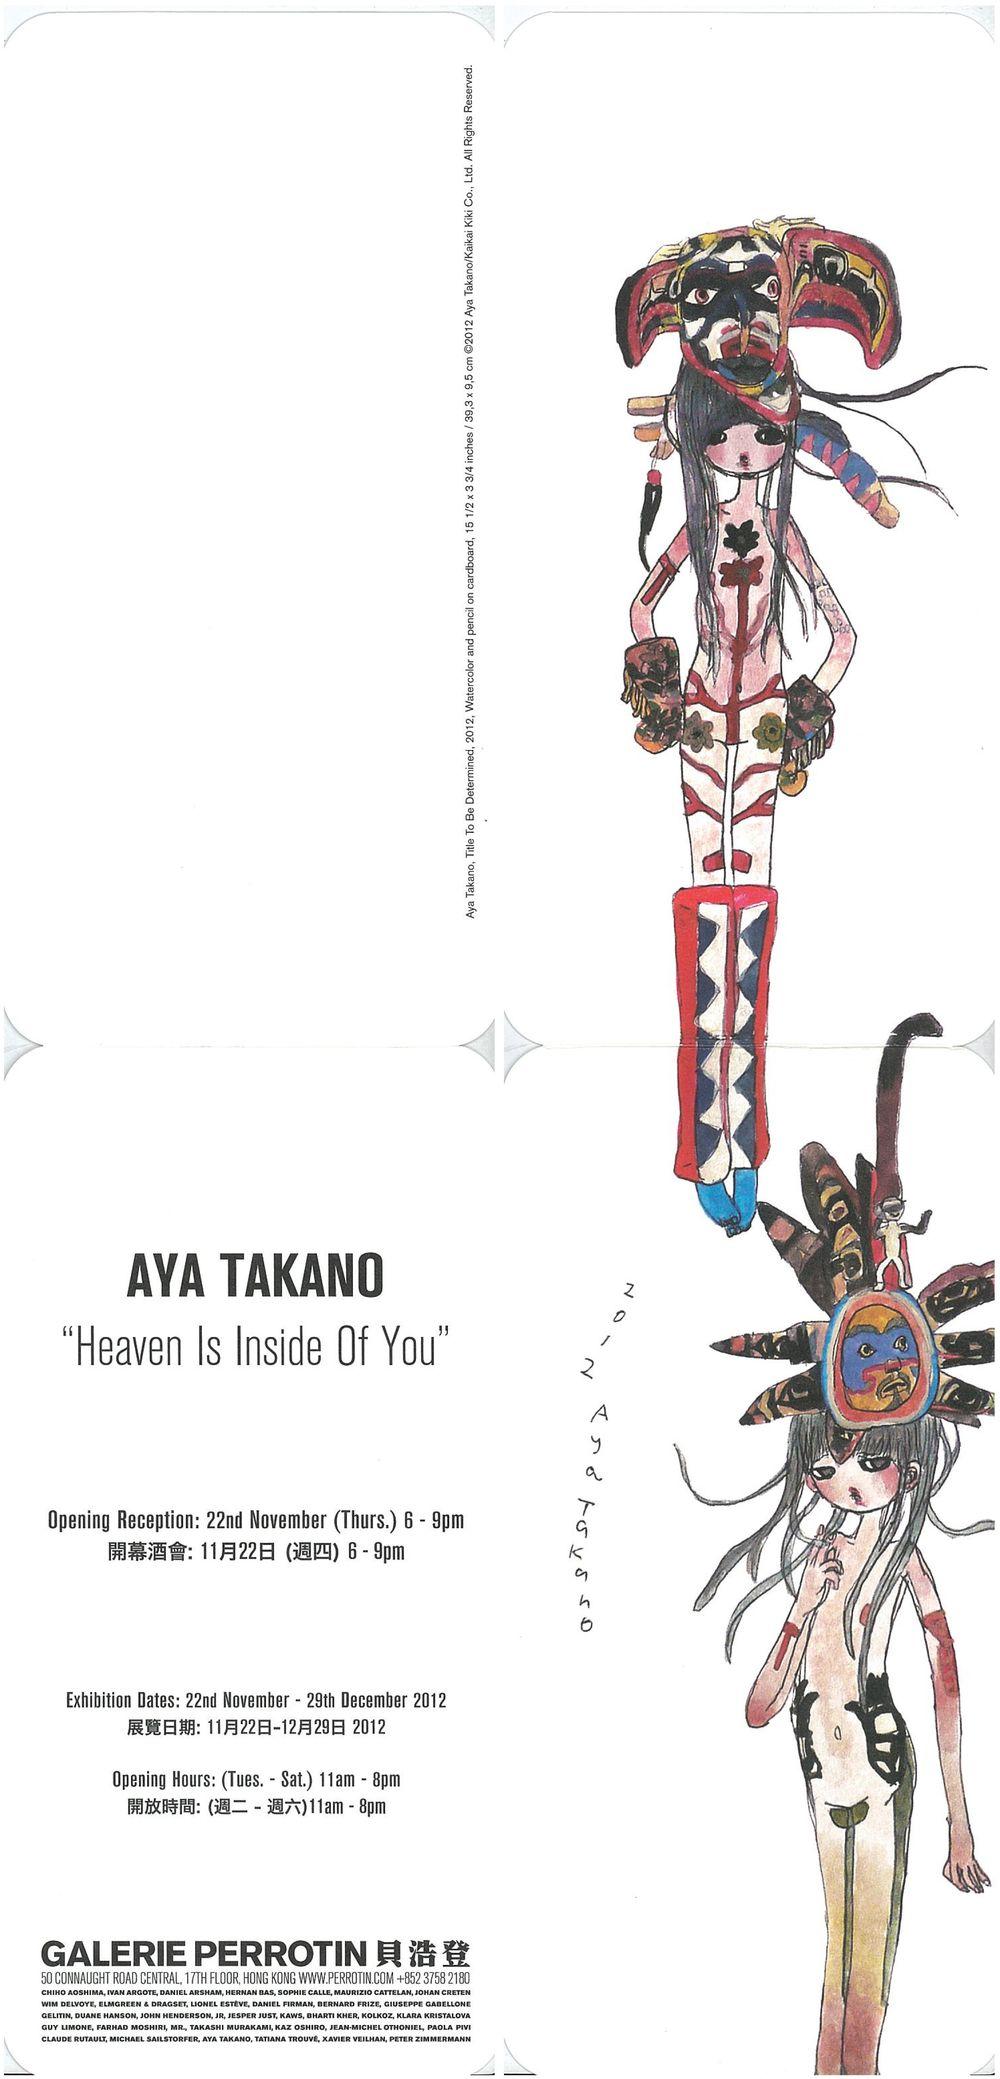 Artist:Aya TAKANO, Exhibition:Heaven Is Inside Of You